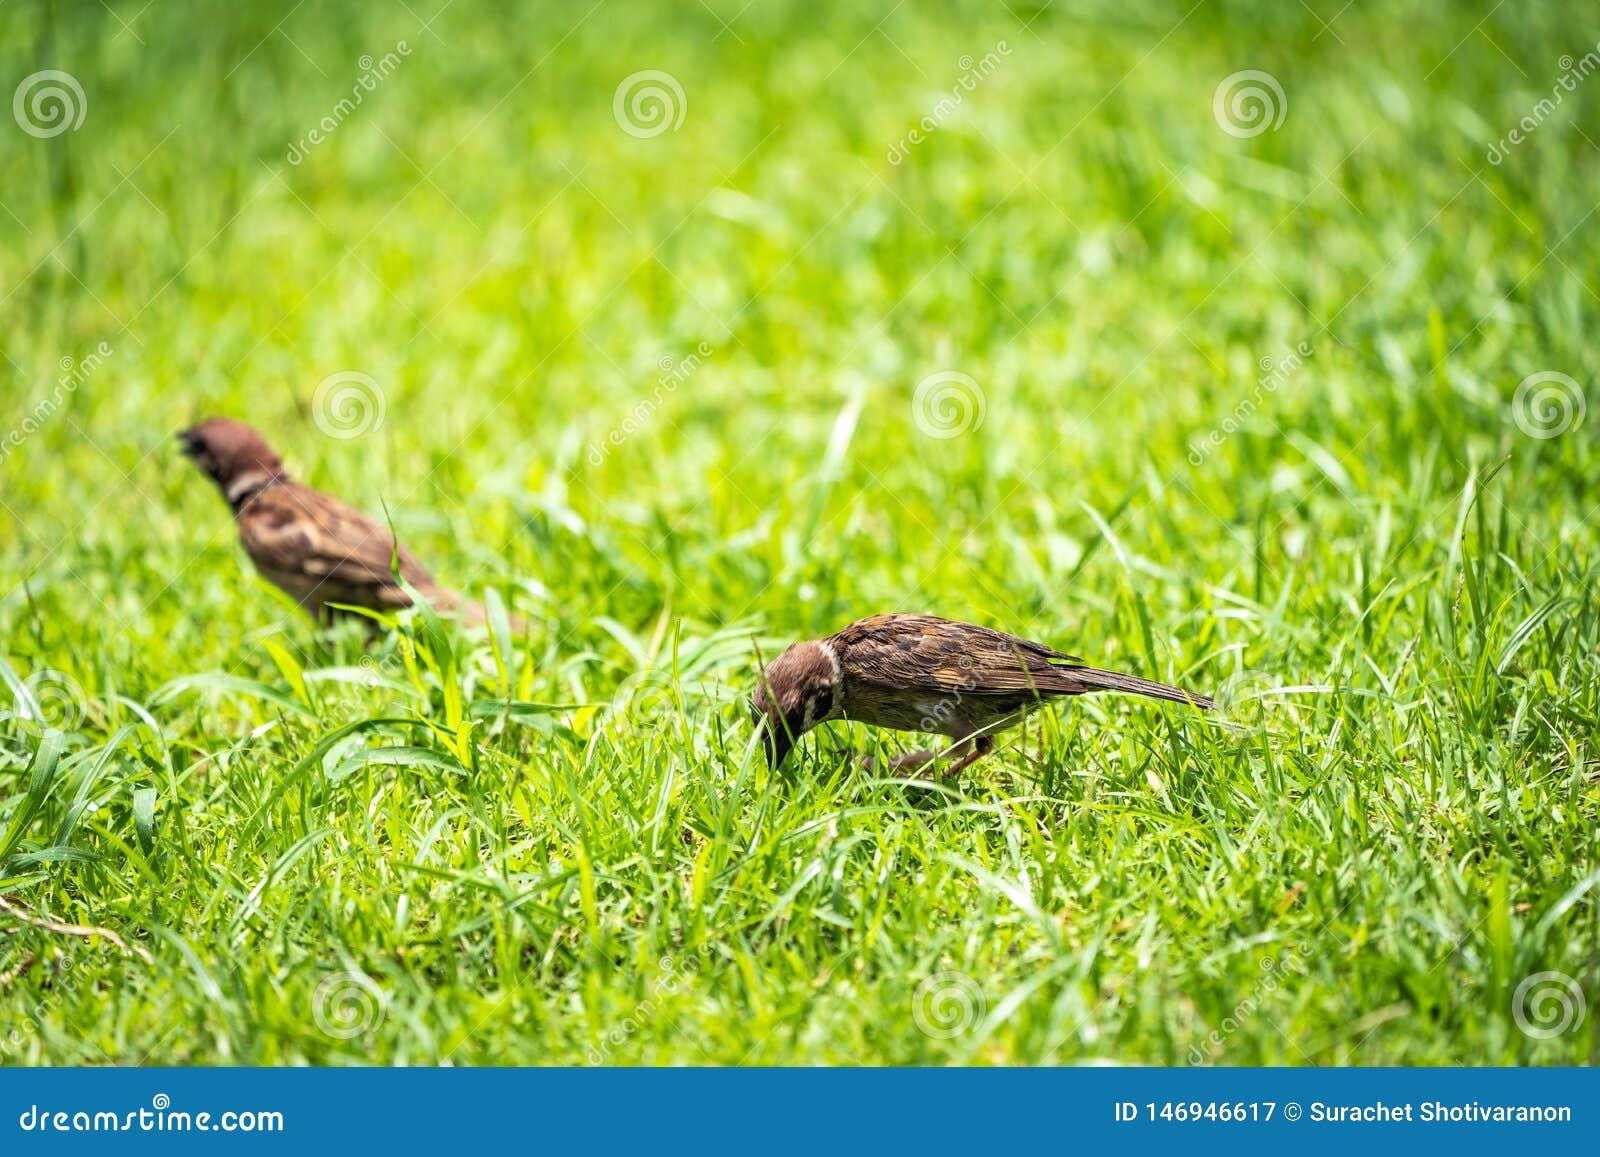 Thailand weinig bruine musvogel in graden en parkeert